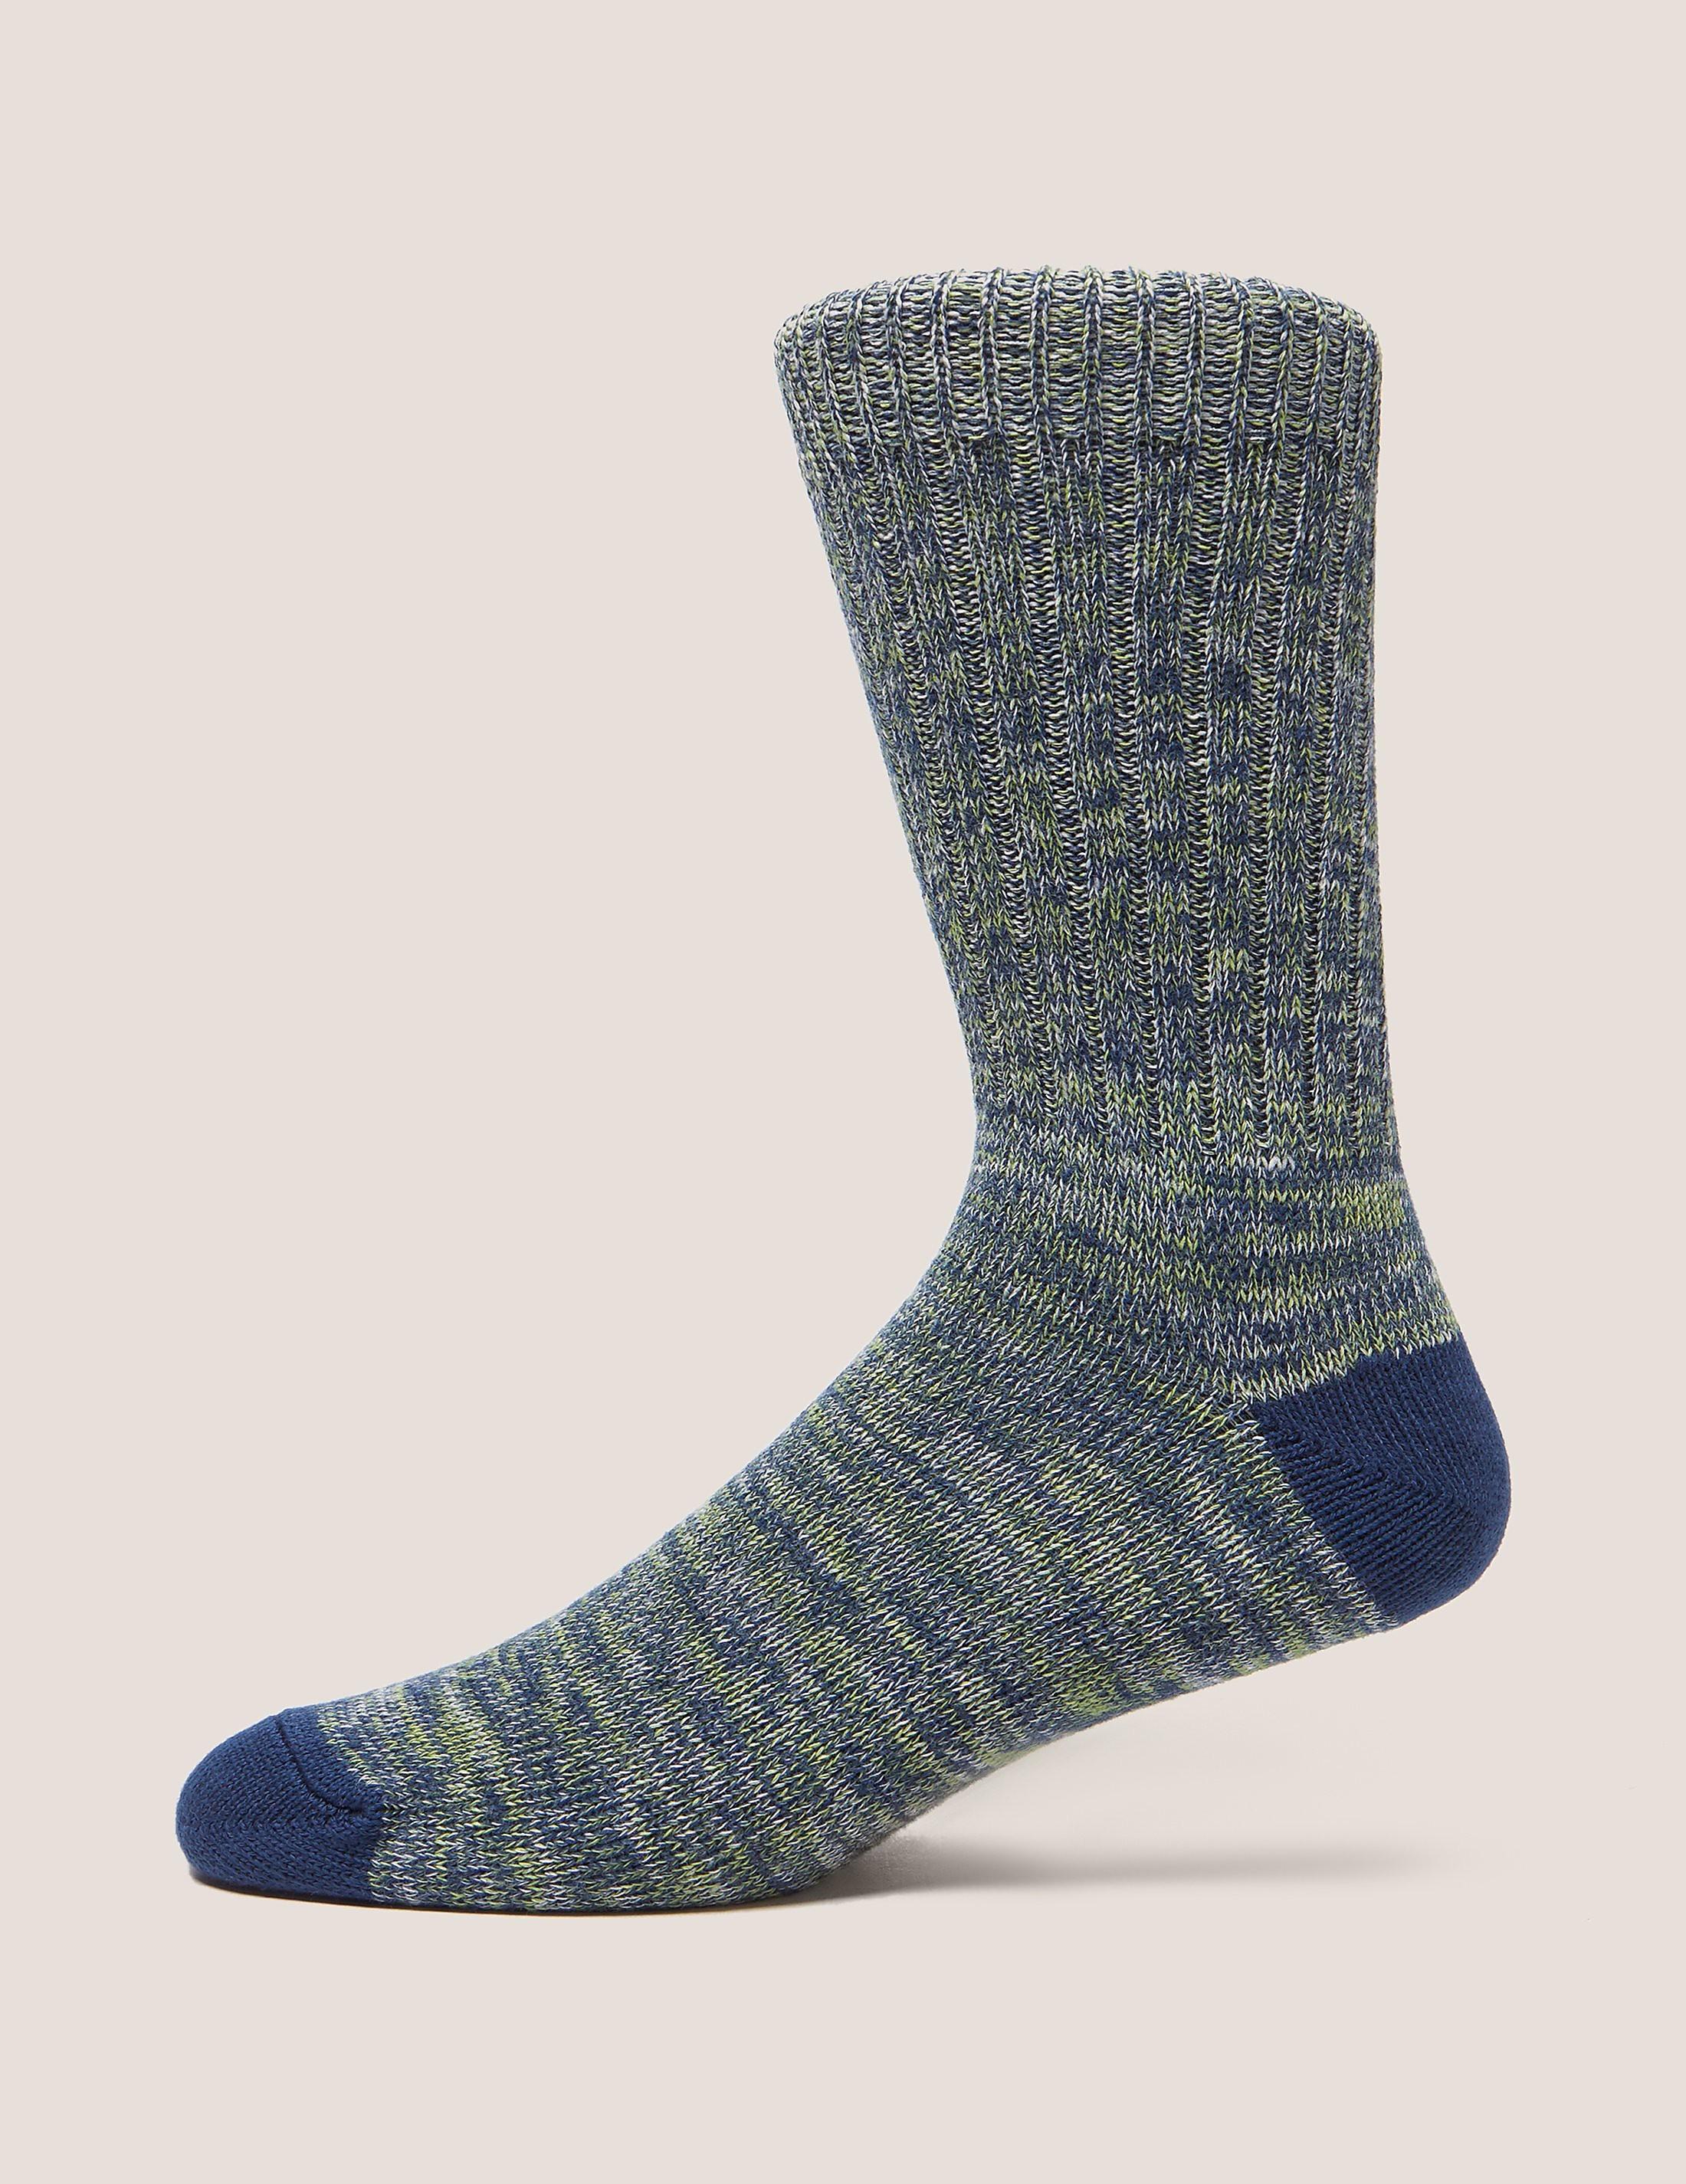 Barbour Deck Socks